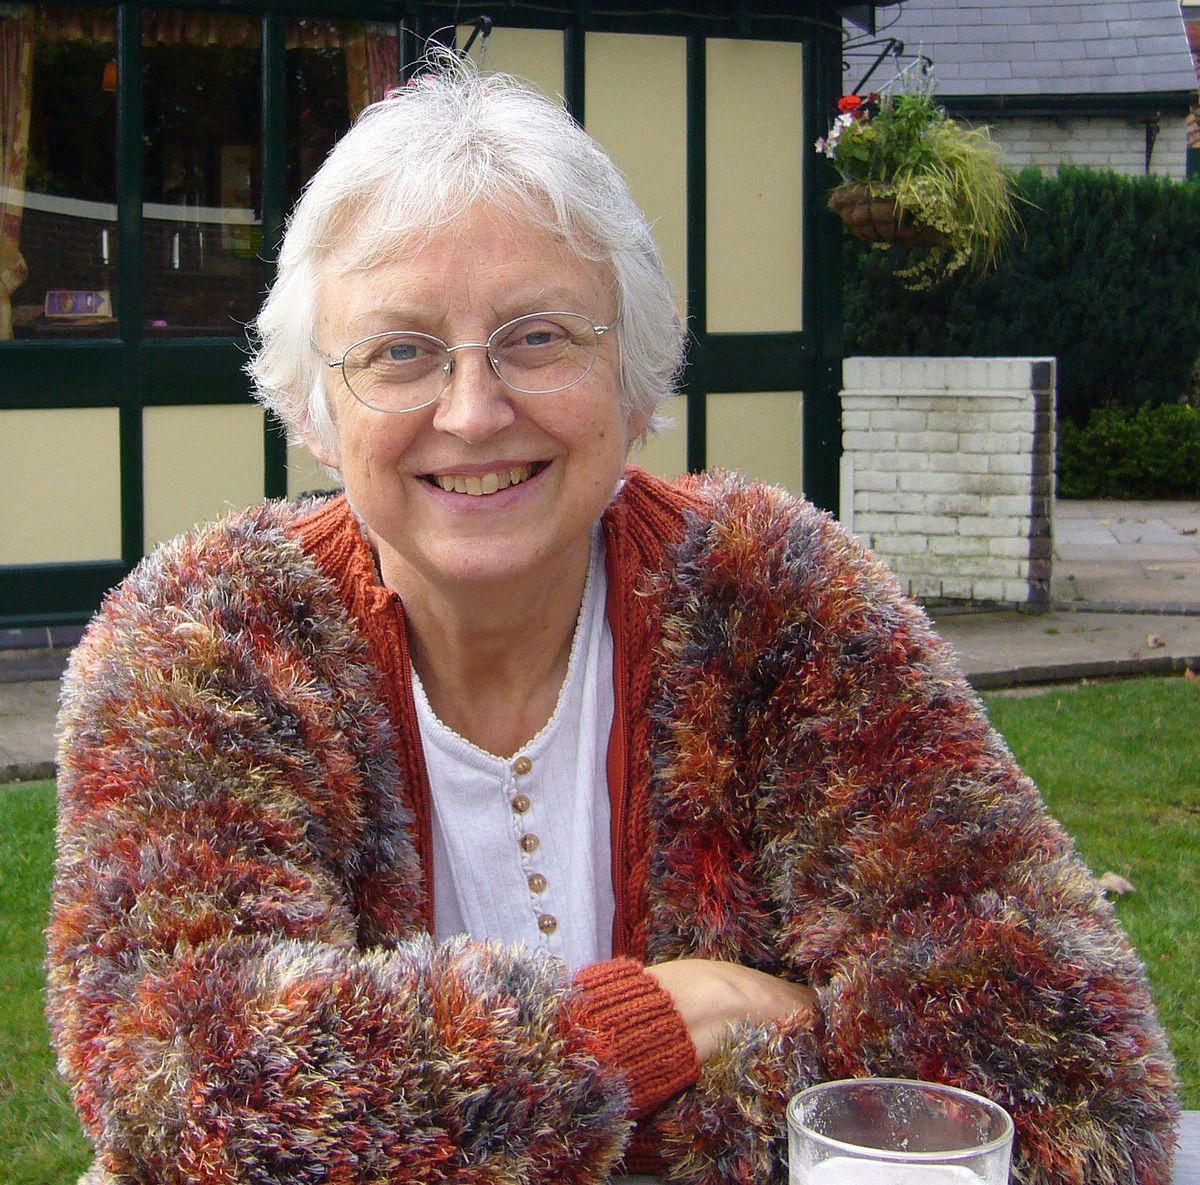 Eyelash yarn - Wikipedia